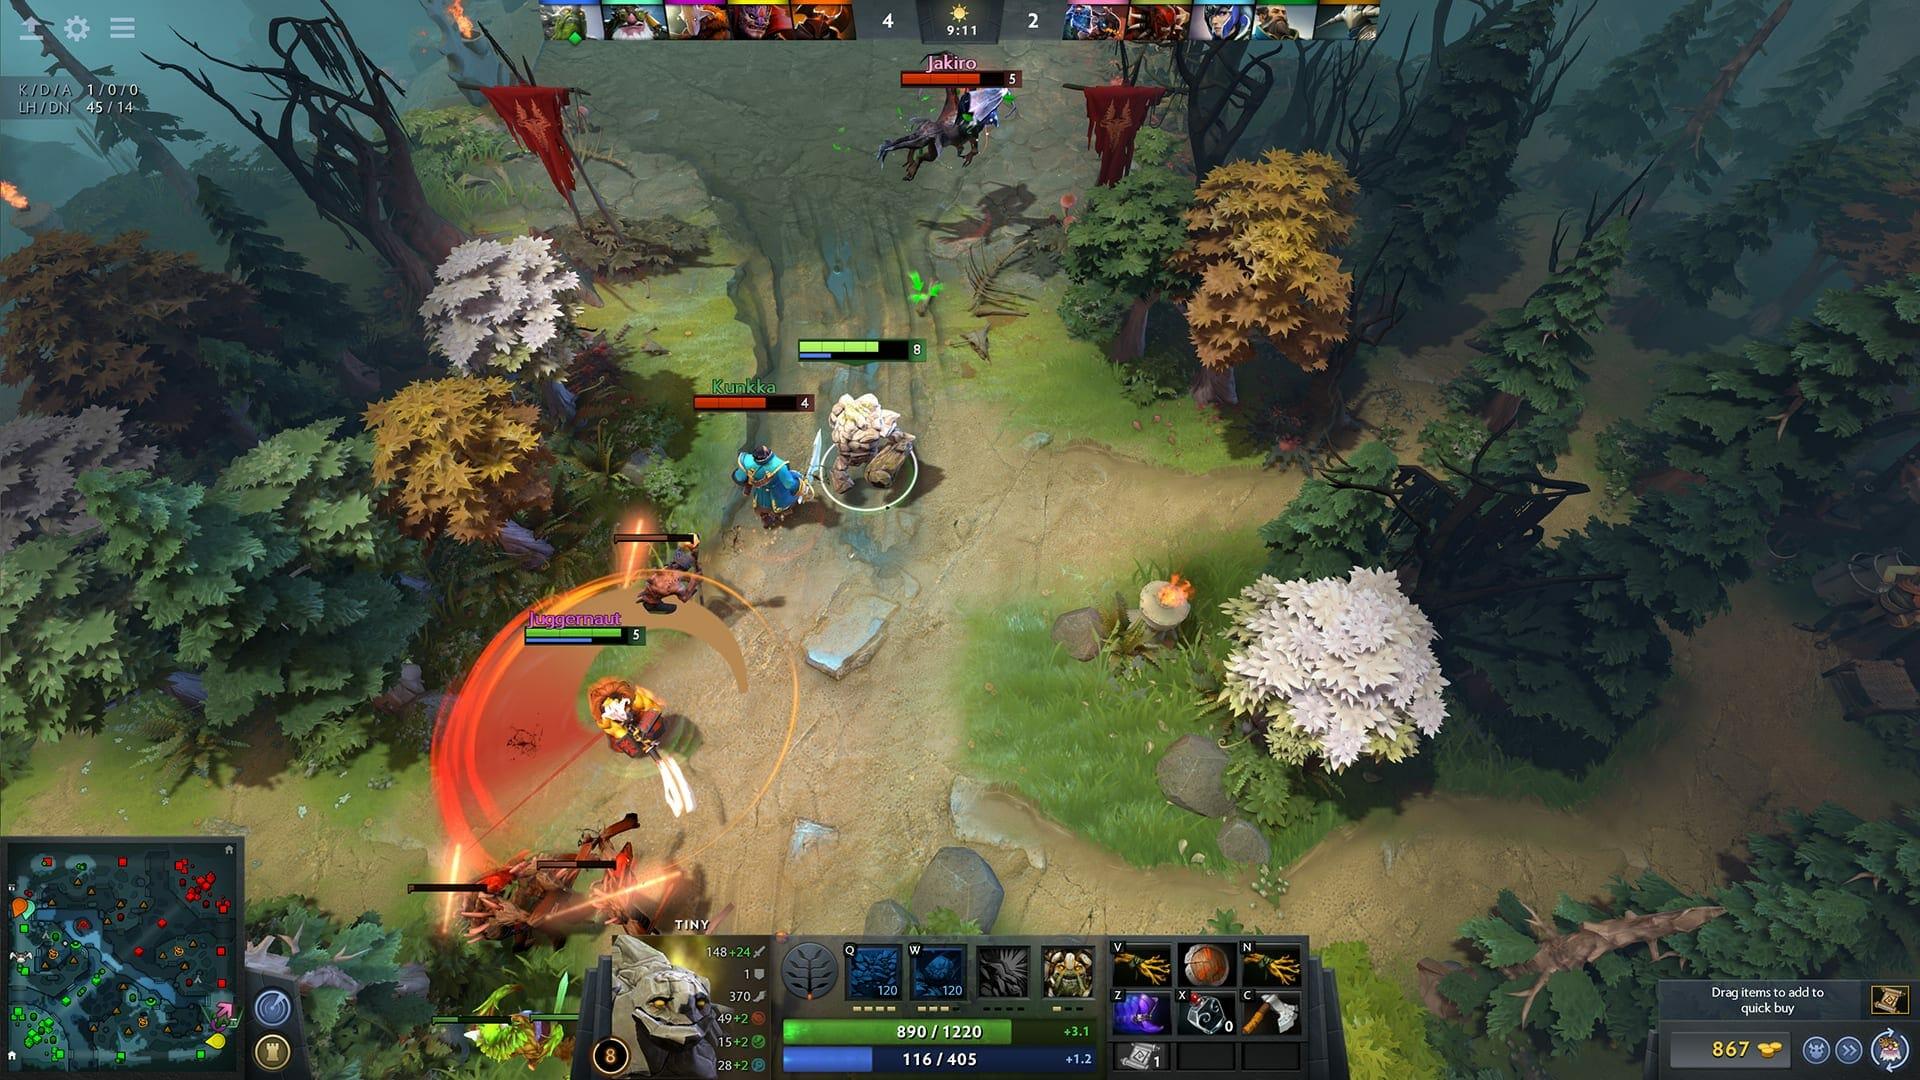 Dota 2 screenshot - Dota 2 7.22c Patch (GAMEPLAY UPDATE): Balancing Heroes Once Again